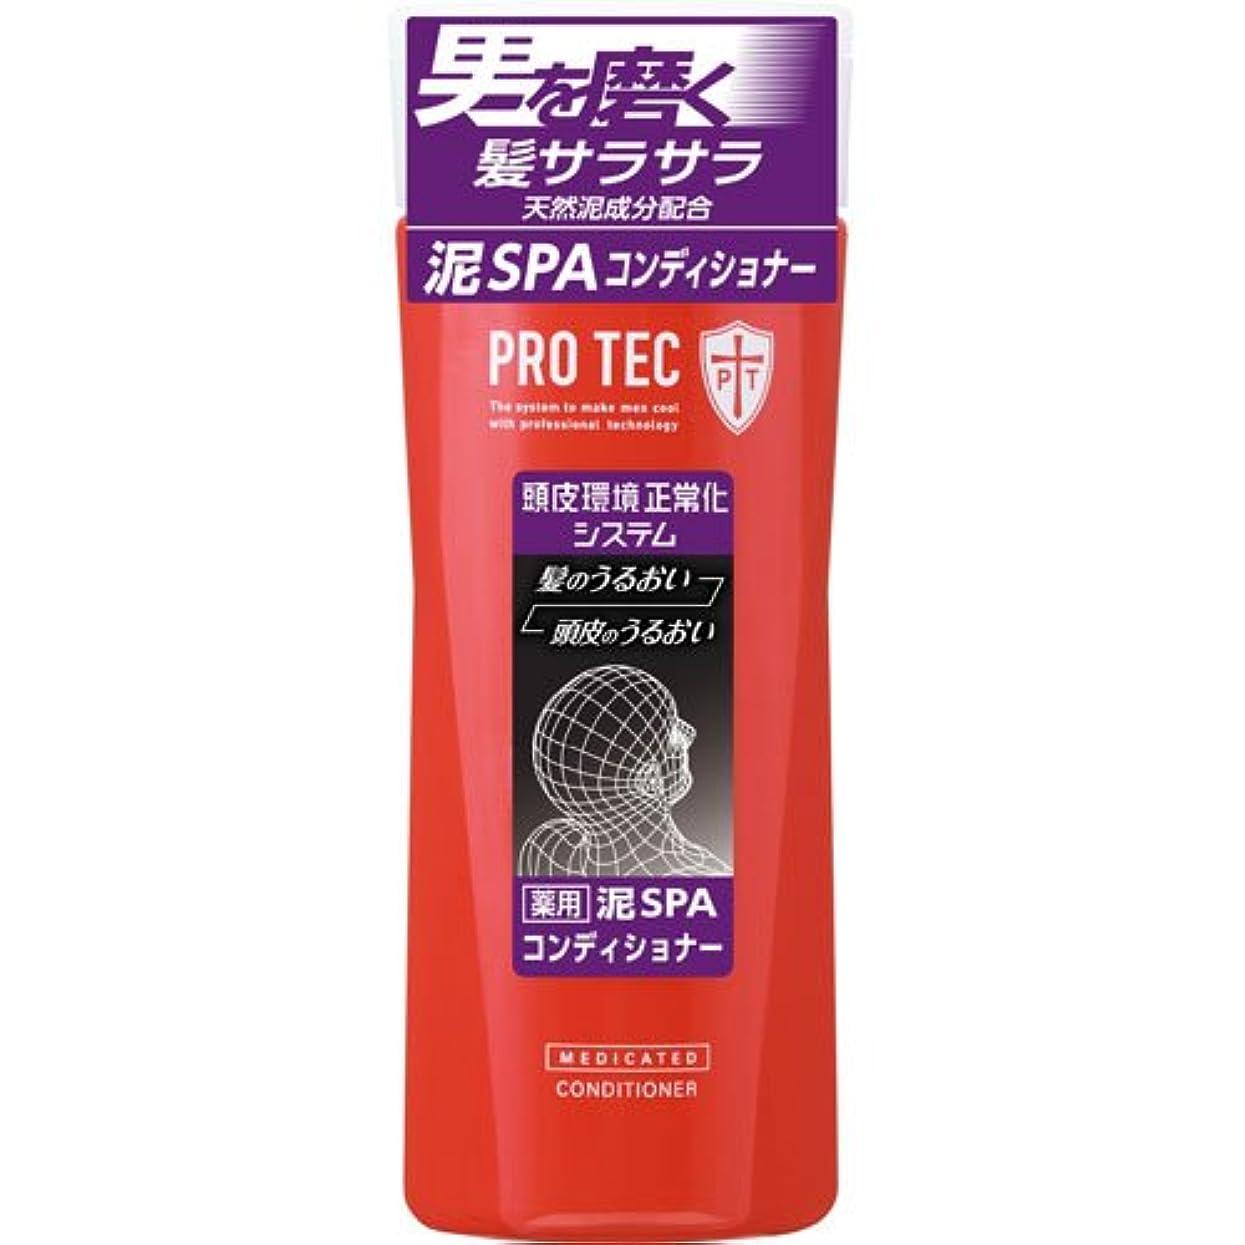 PRO TEC 泥SPAコンディショナー 180ml